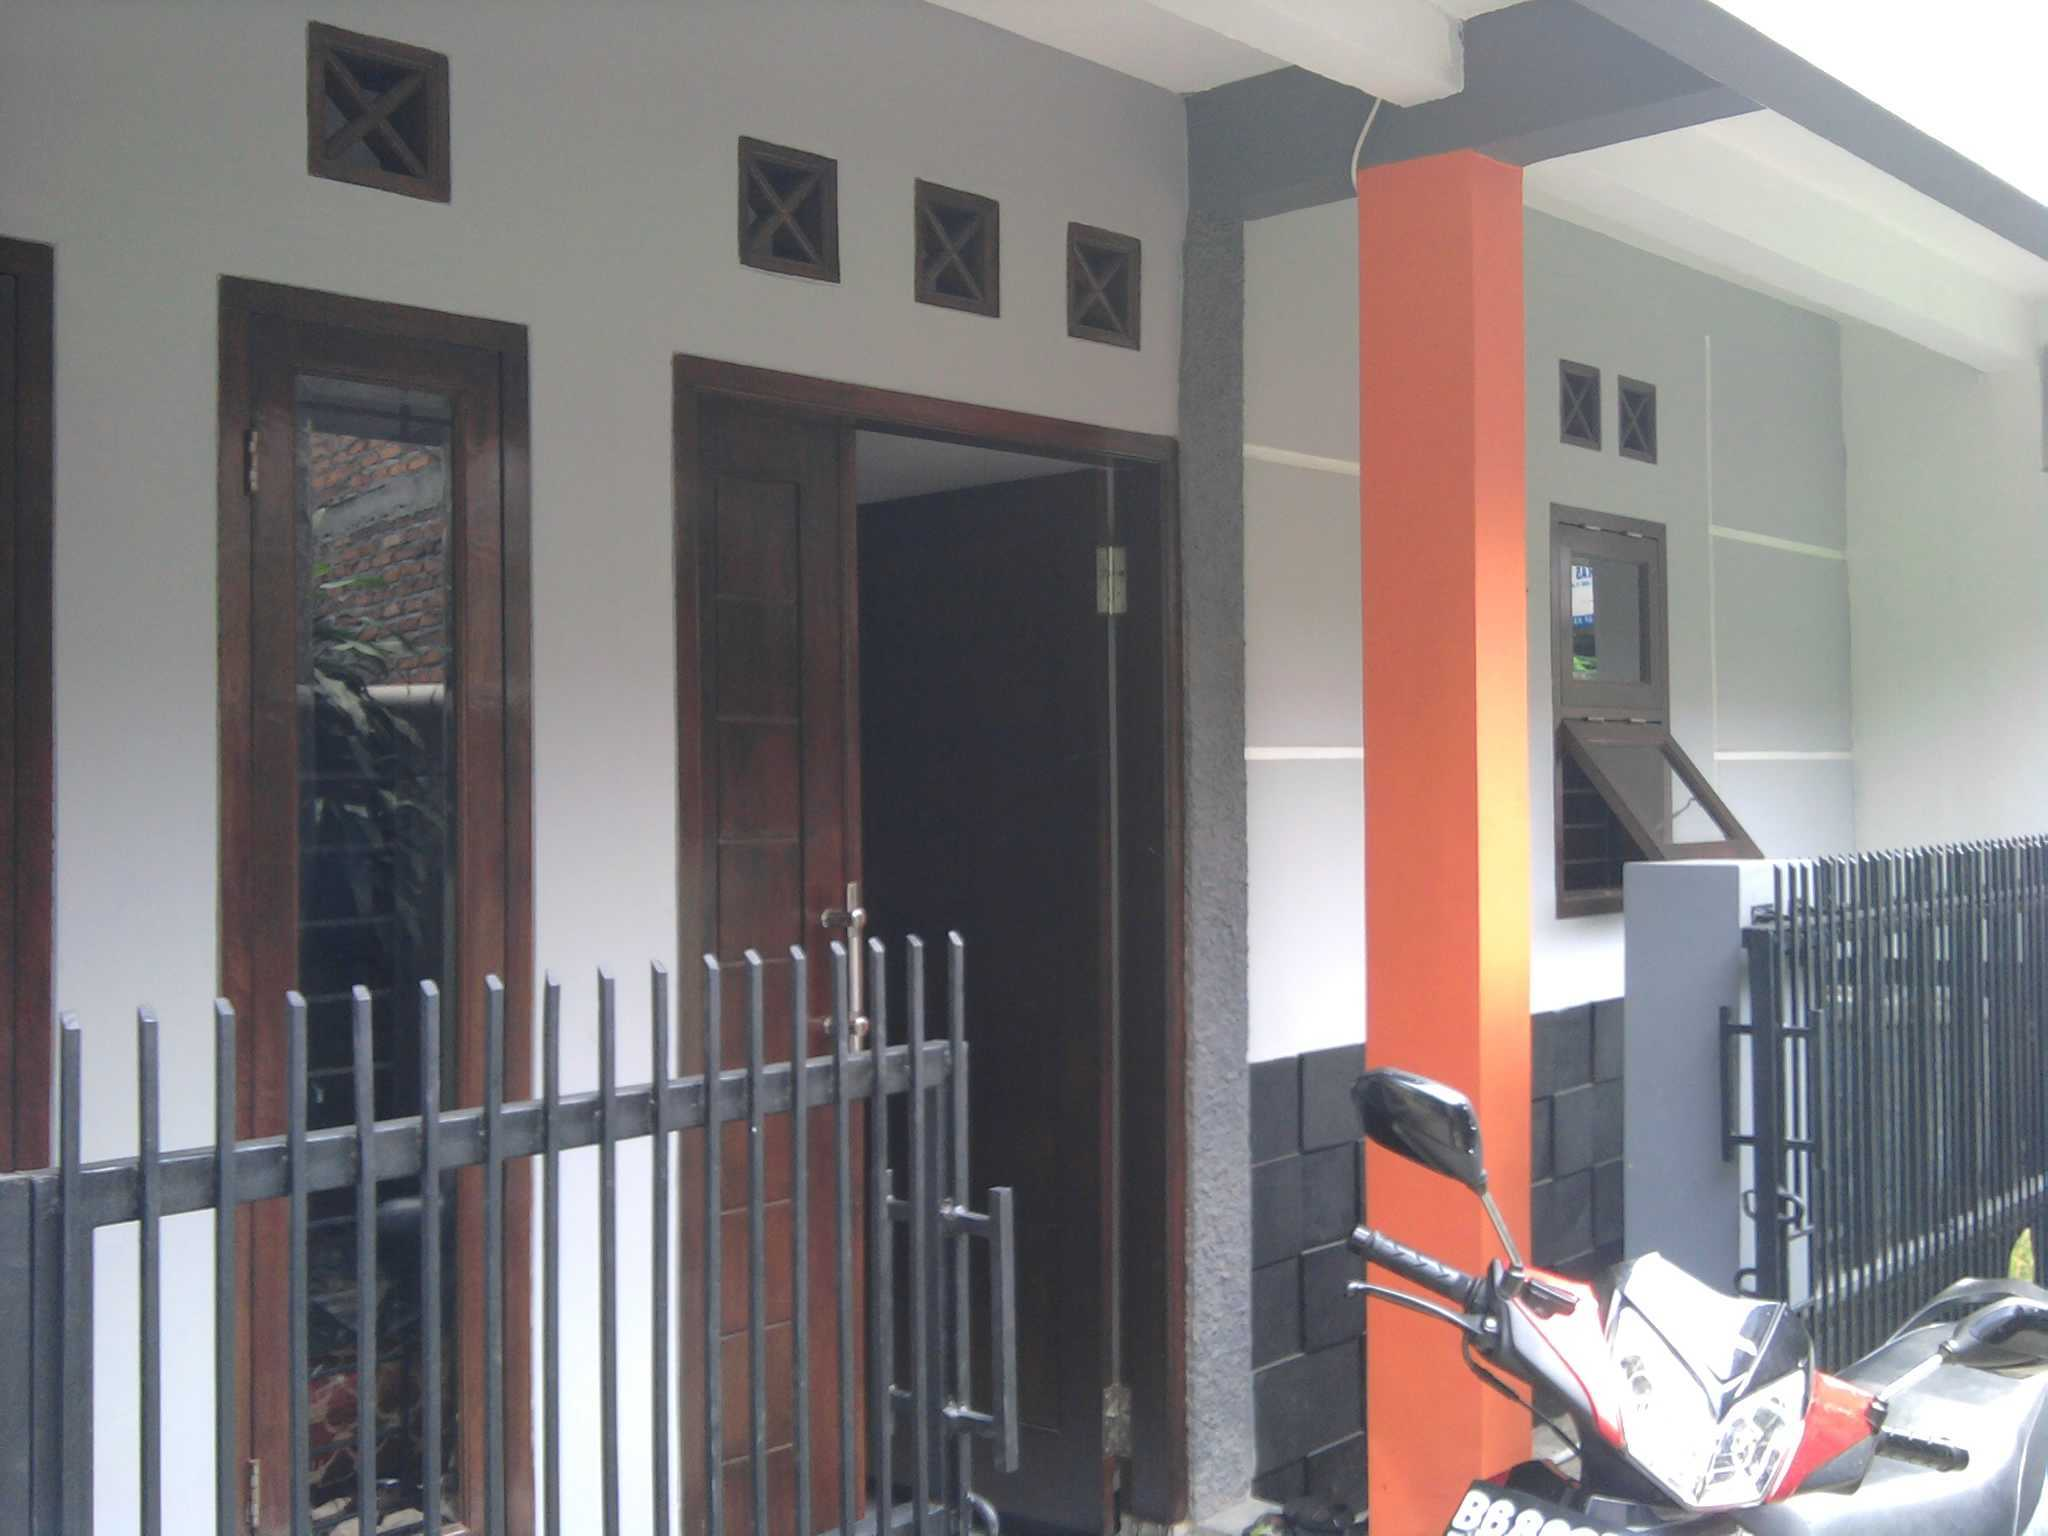 Thoriq & Geger Renovasi Rumah (Modernisasi) - Cipinang Muara Daerah Khusus Ibukota Jakarta, Indonesia Daerah Khusus Ibukota Jakarta, Indonesia Photo0047   37723